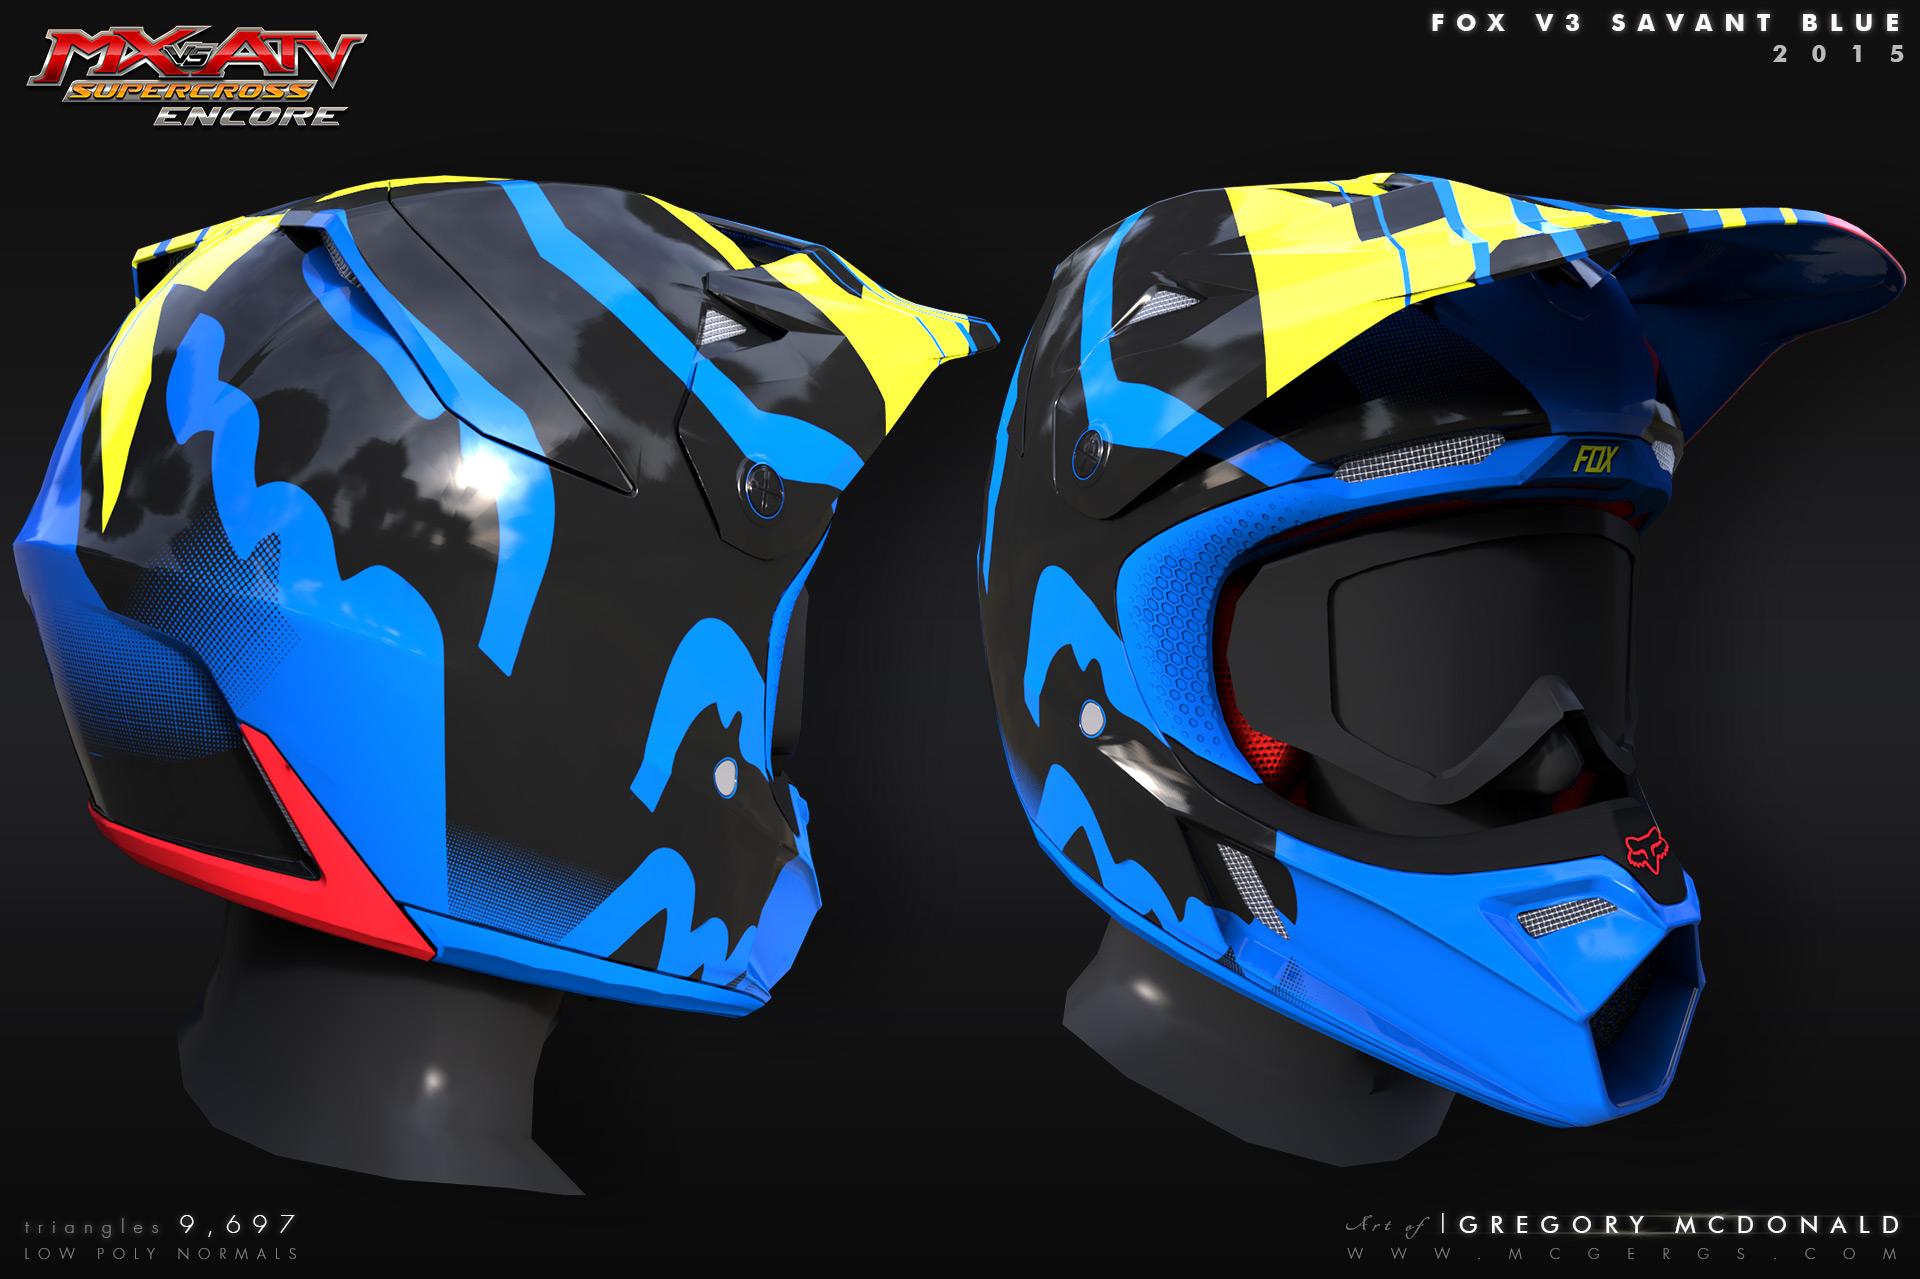 Helmet_FoxV3_Savant_Blue